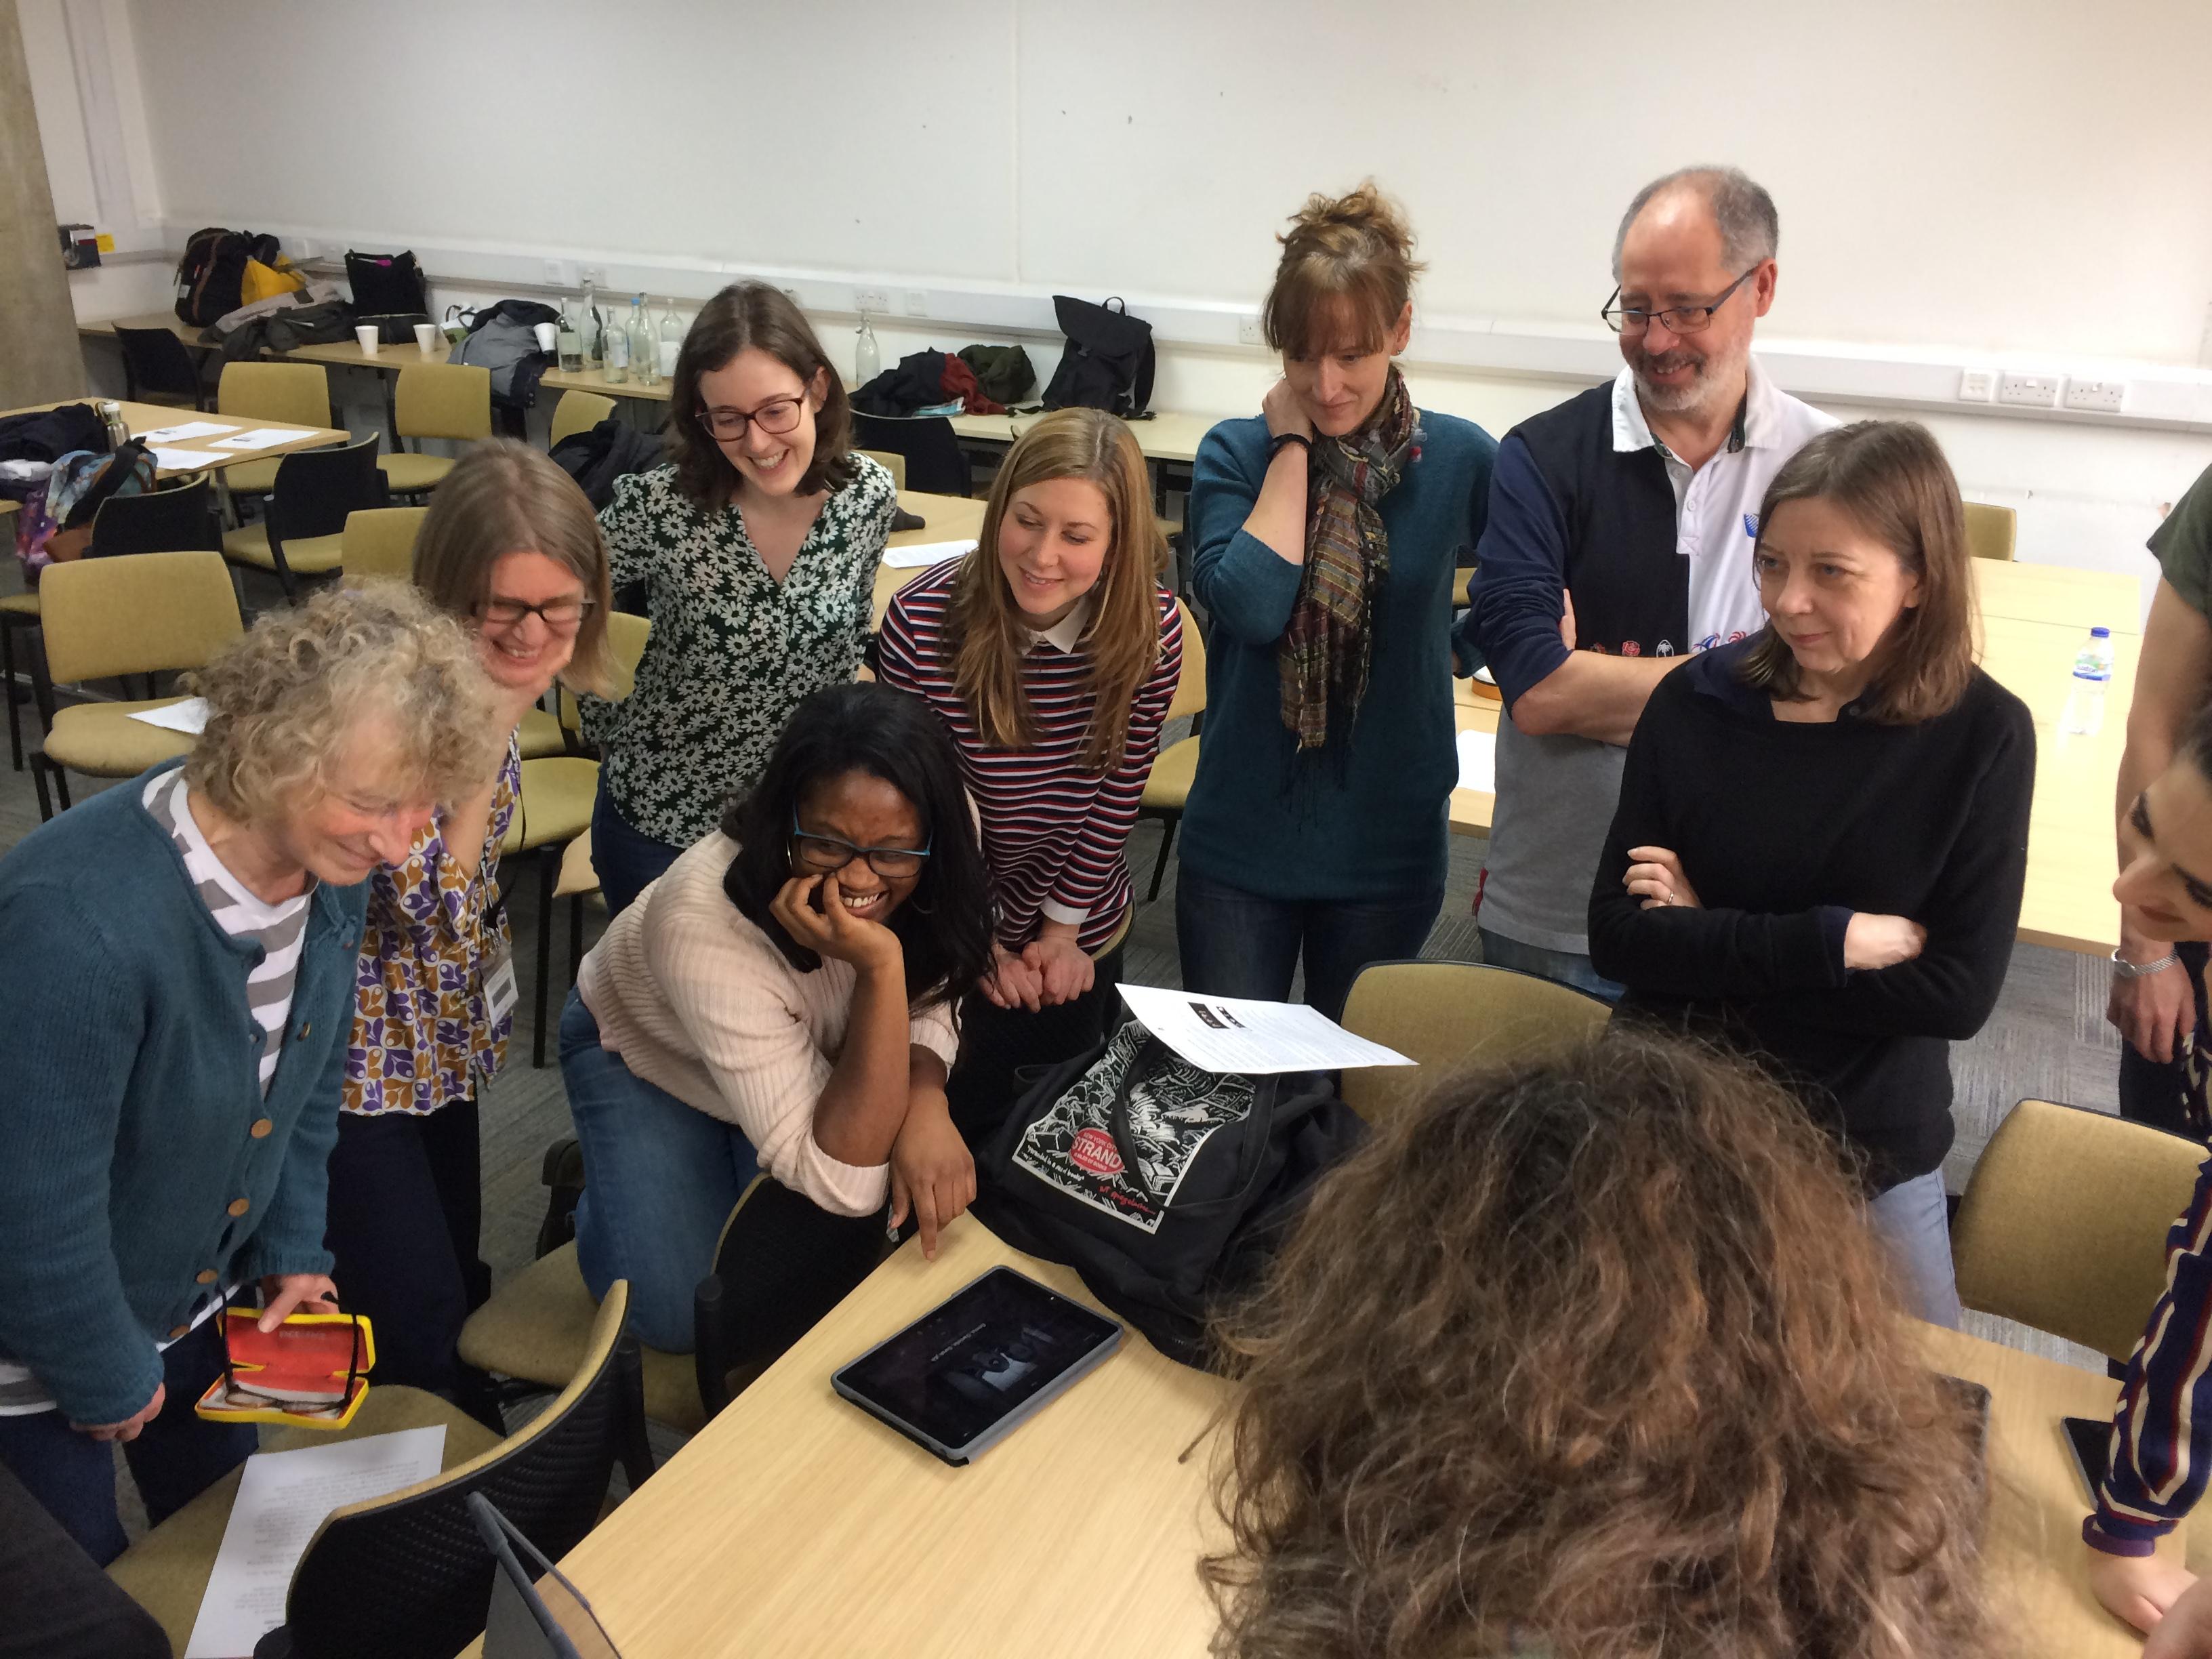 Incorrigibly Plural – A L.A.T.E. Conference in celebration of Morlette Lindsay